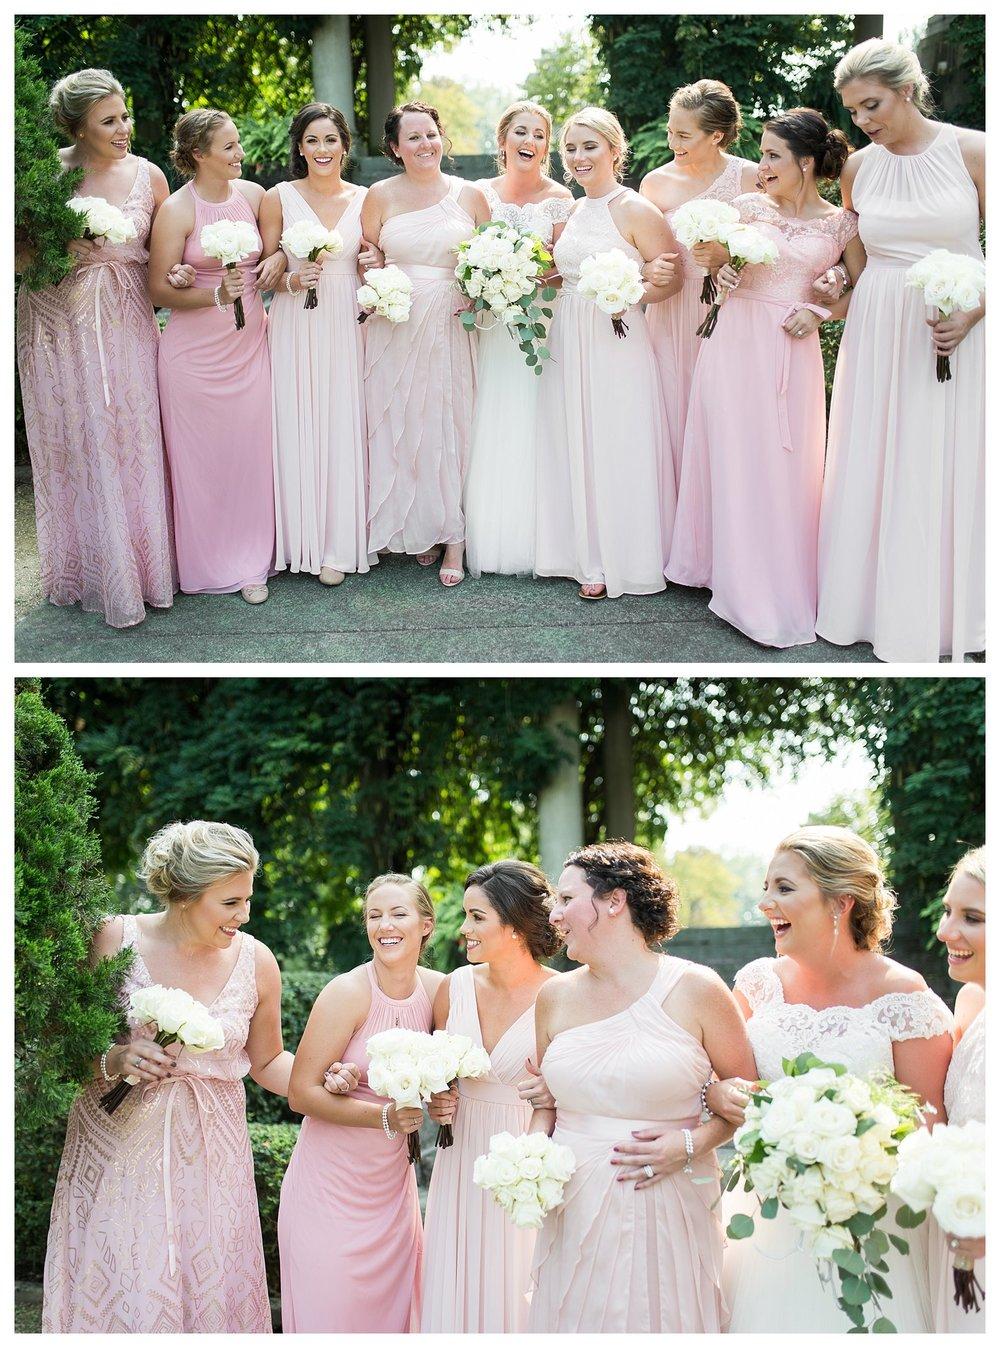 laurel-court-wedding-everleigh-photography-cincinnati-wedding-photographer-northern-ky-wedding-photographer-21